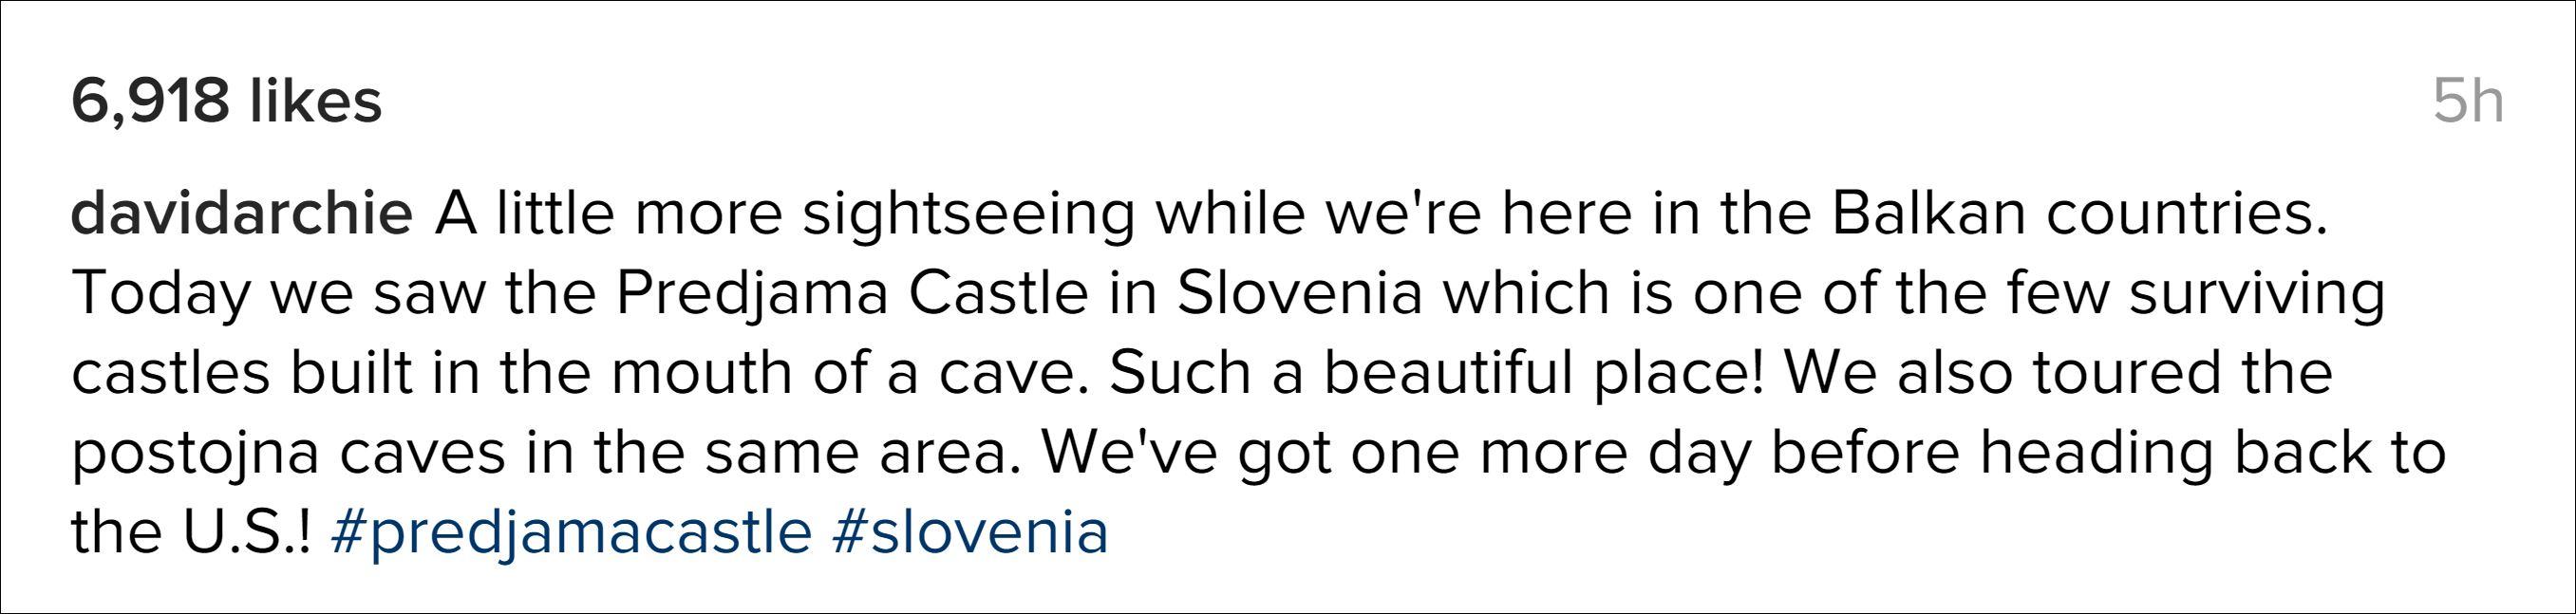 ig predjama castle slovenia